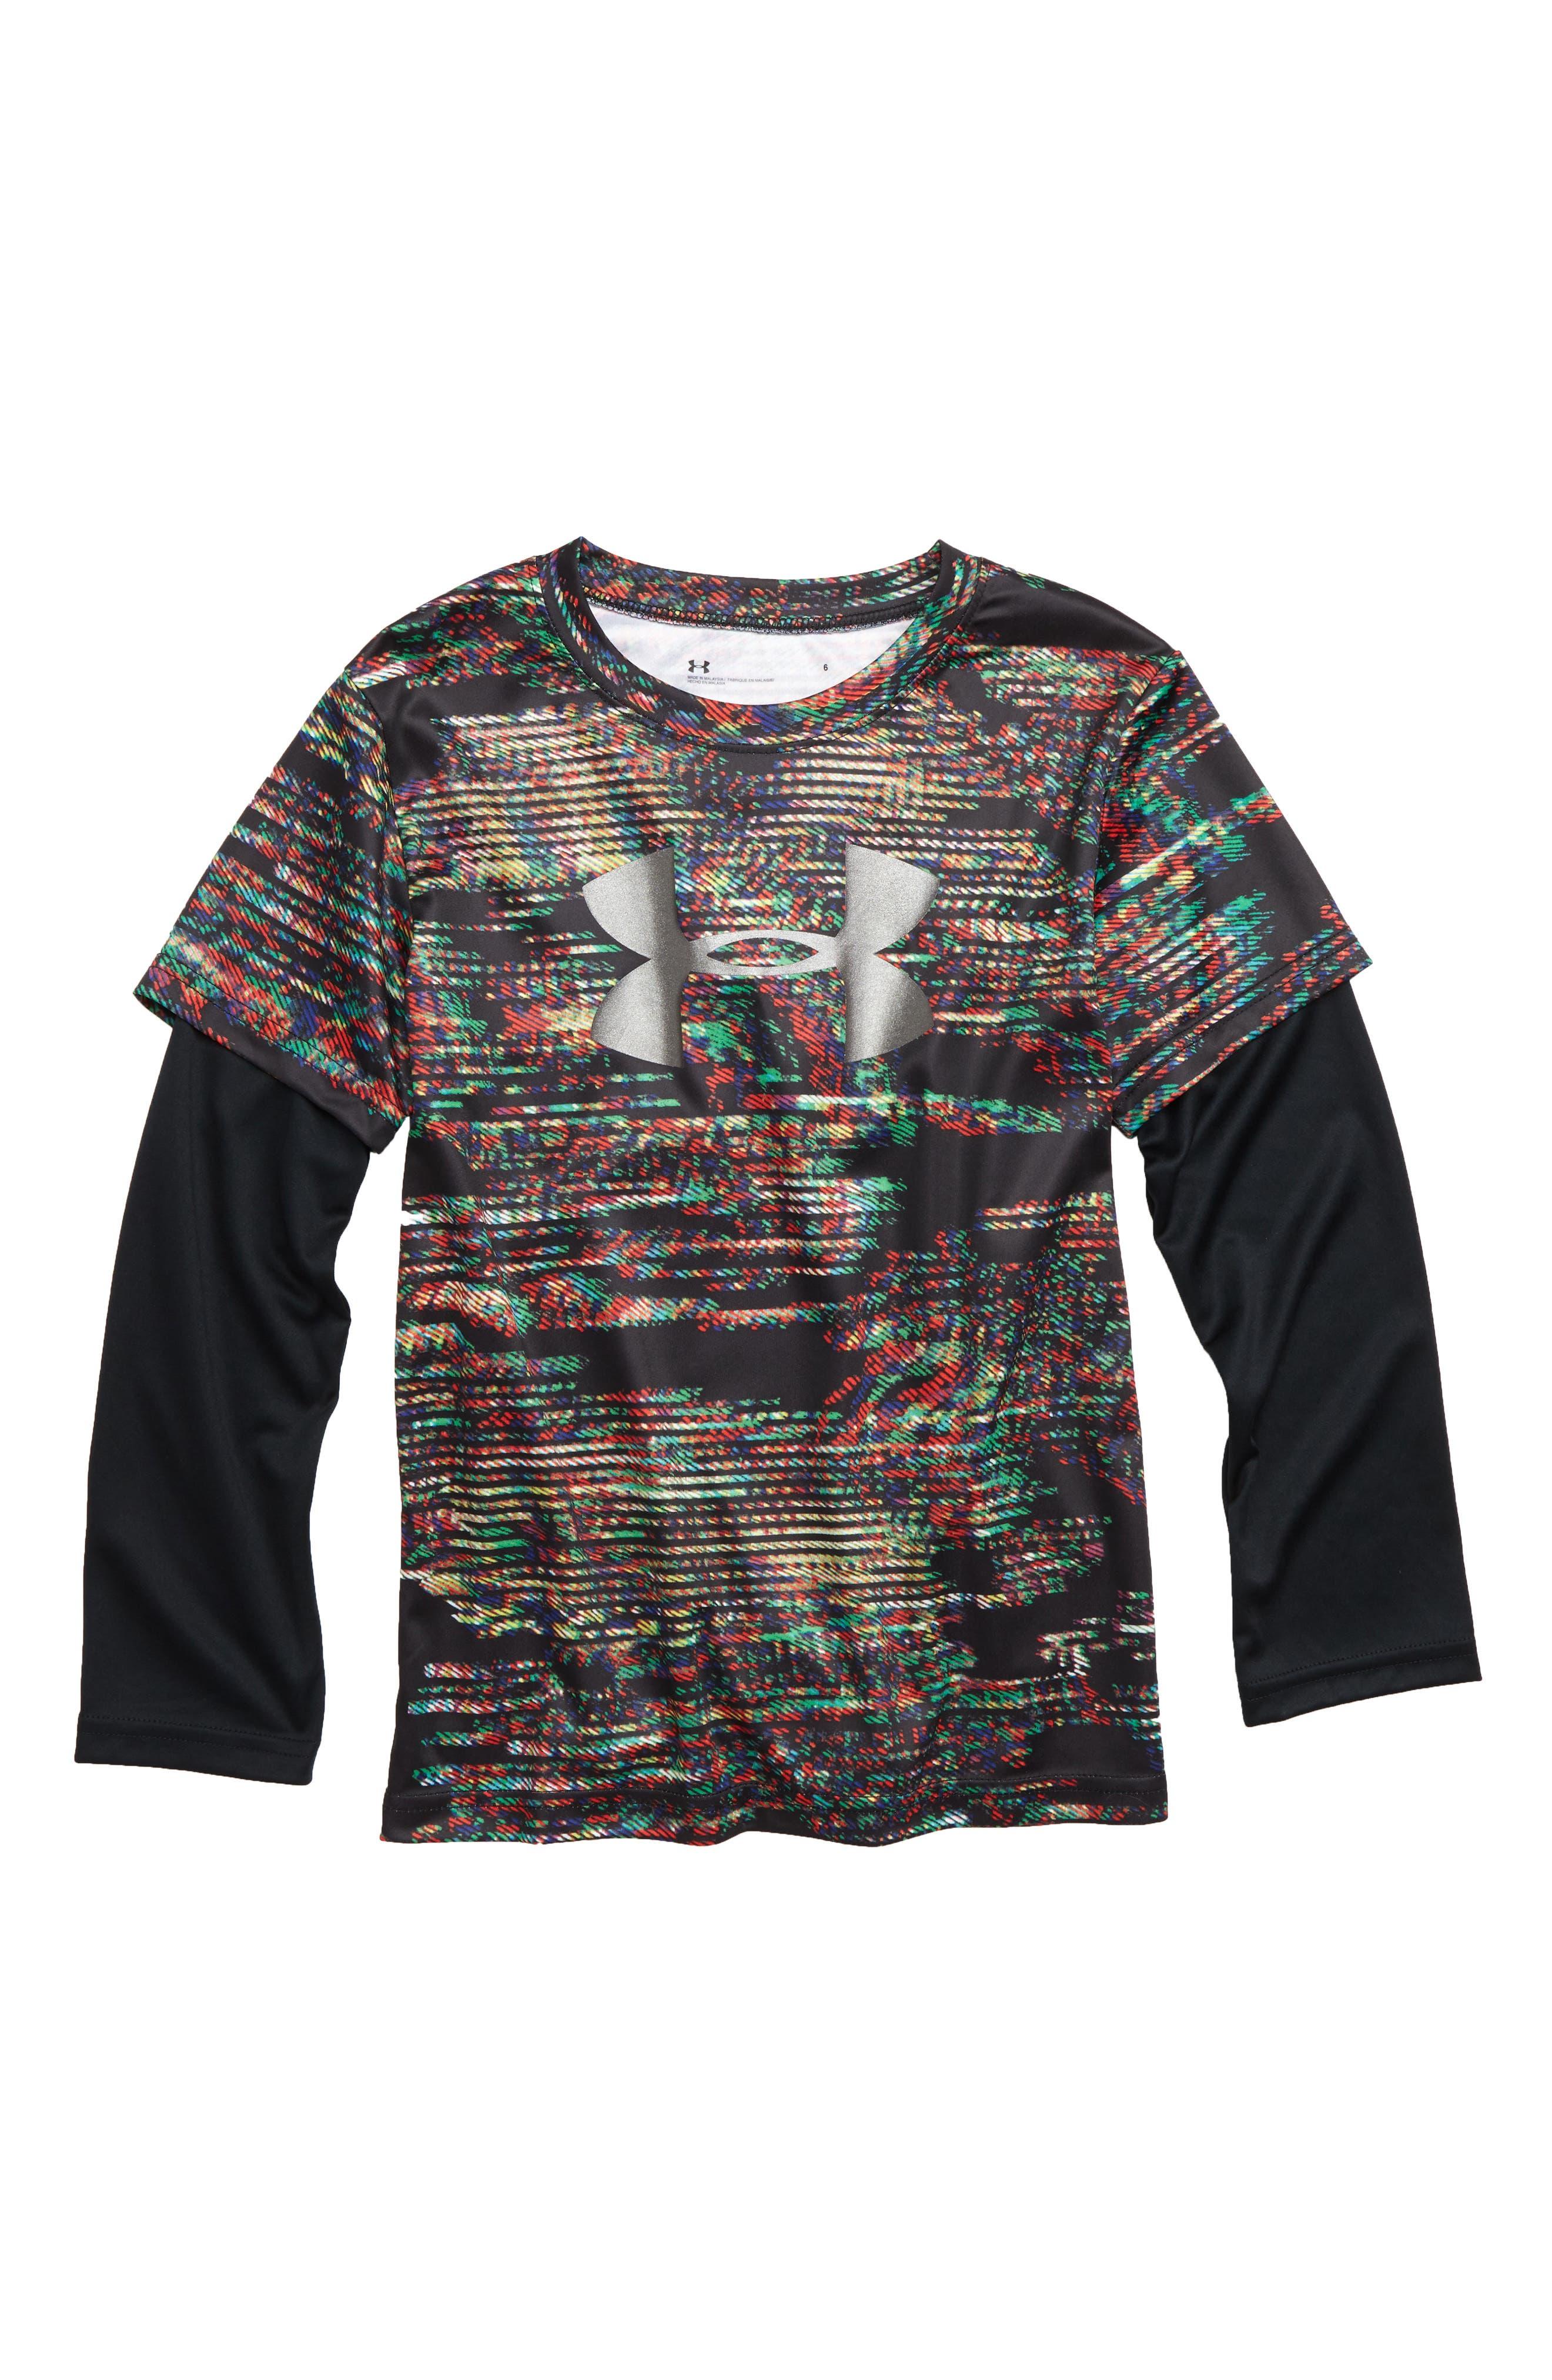 Static Digital Slider Layer T-Shirt,                         Main,                         color, BLACK